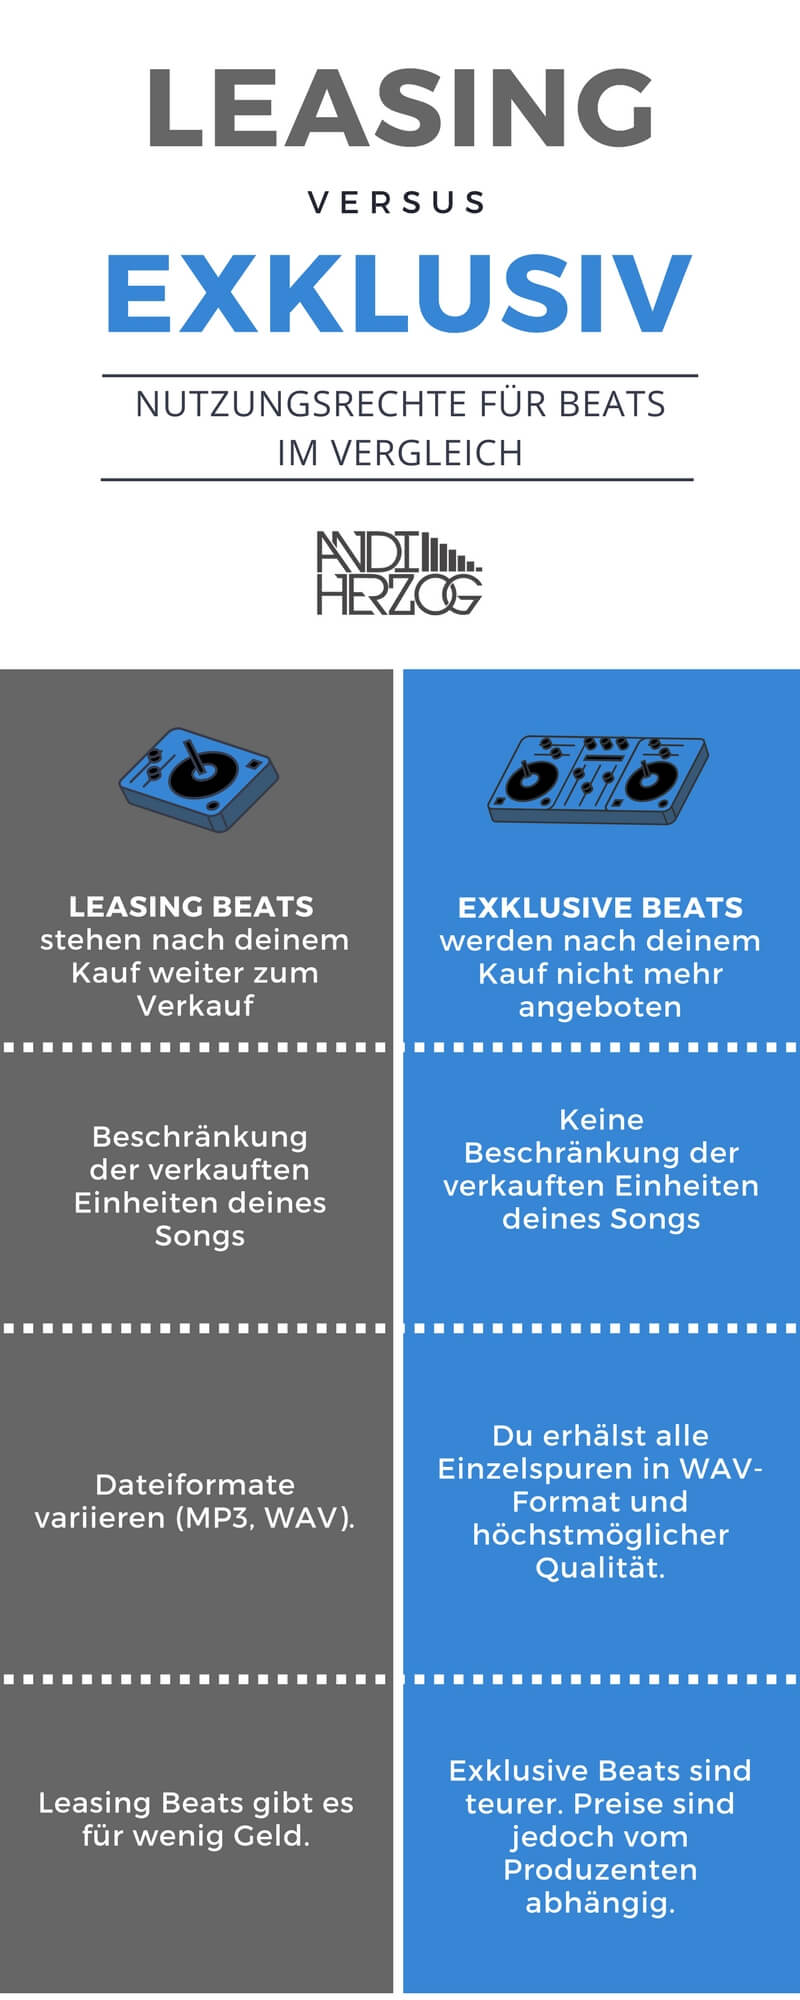 Infografik Leasing Beats vs. Exklusive Beats